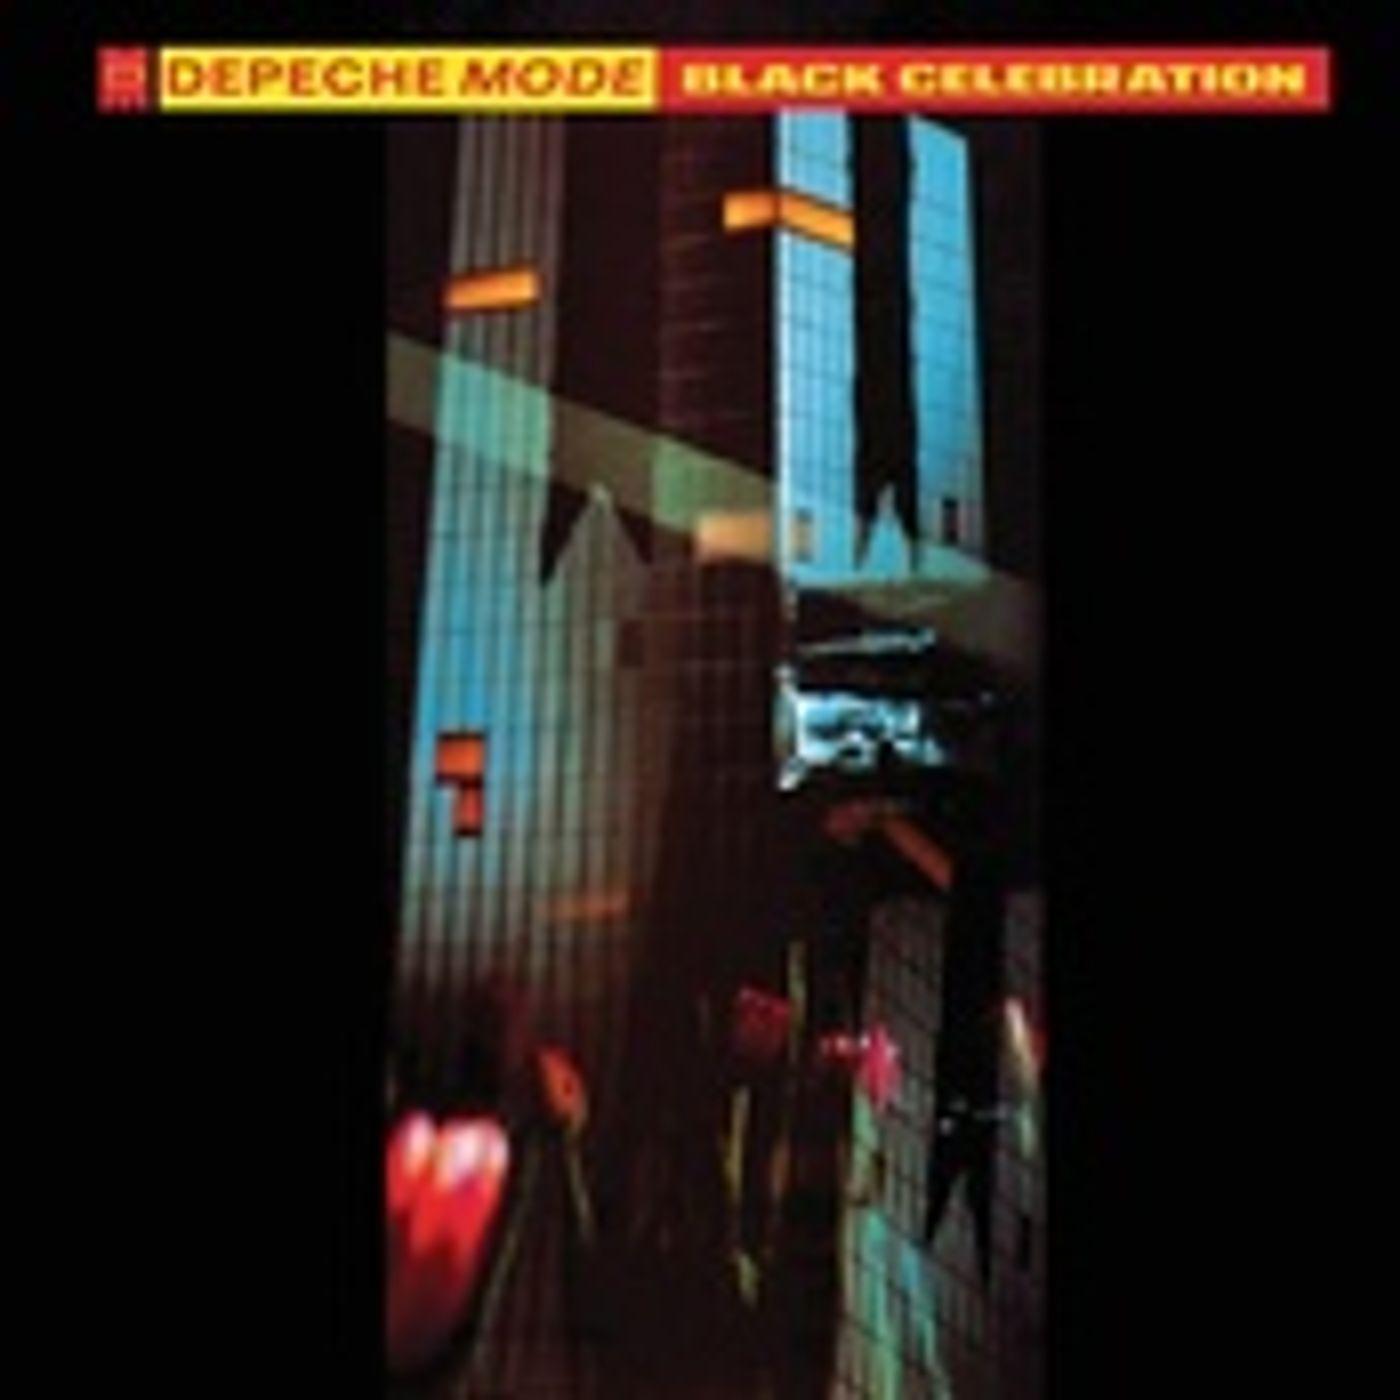 Depeche Mode, Black Celebration